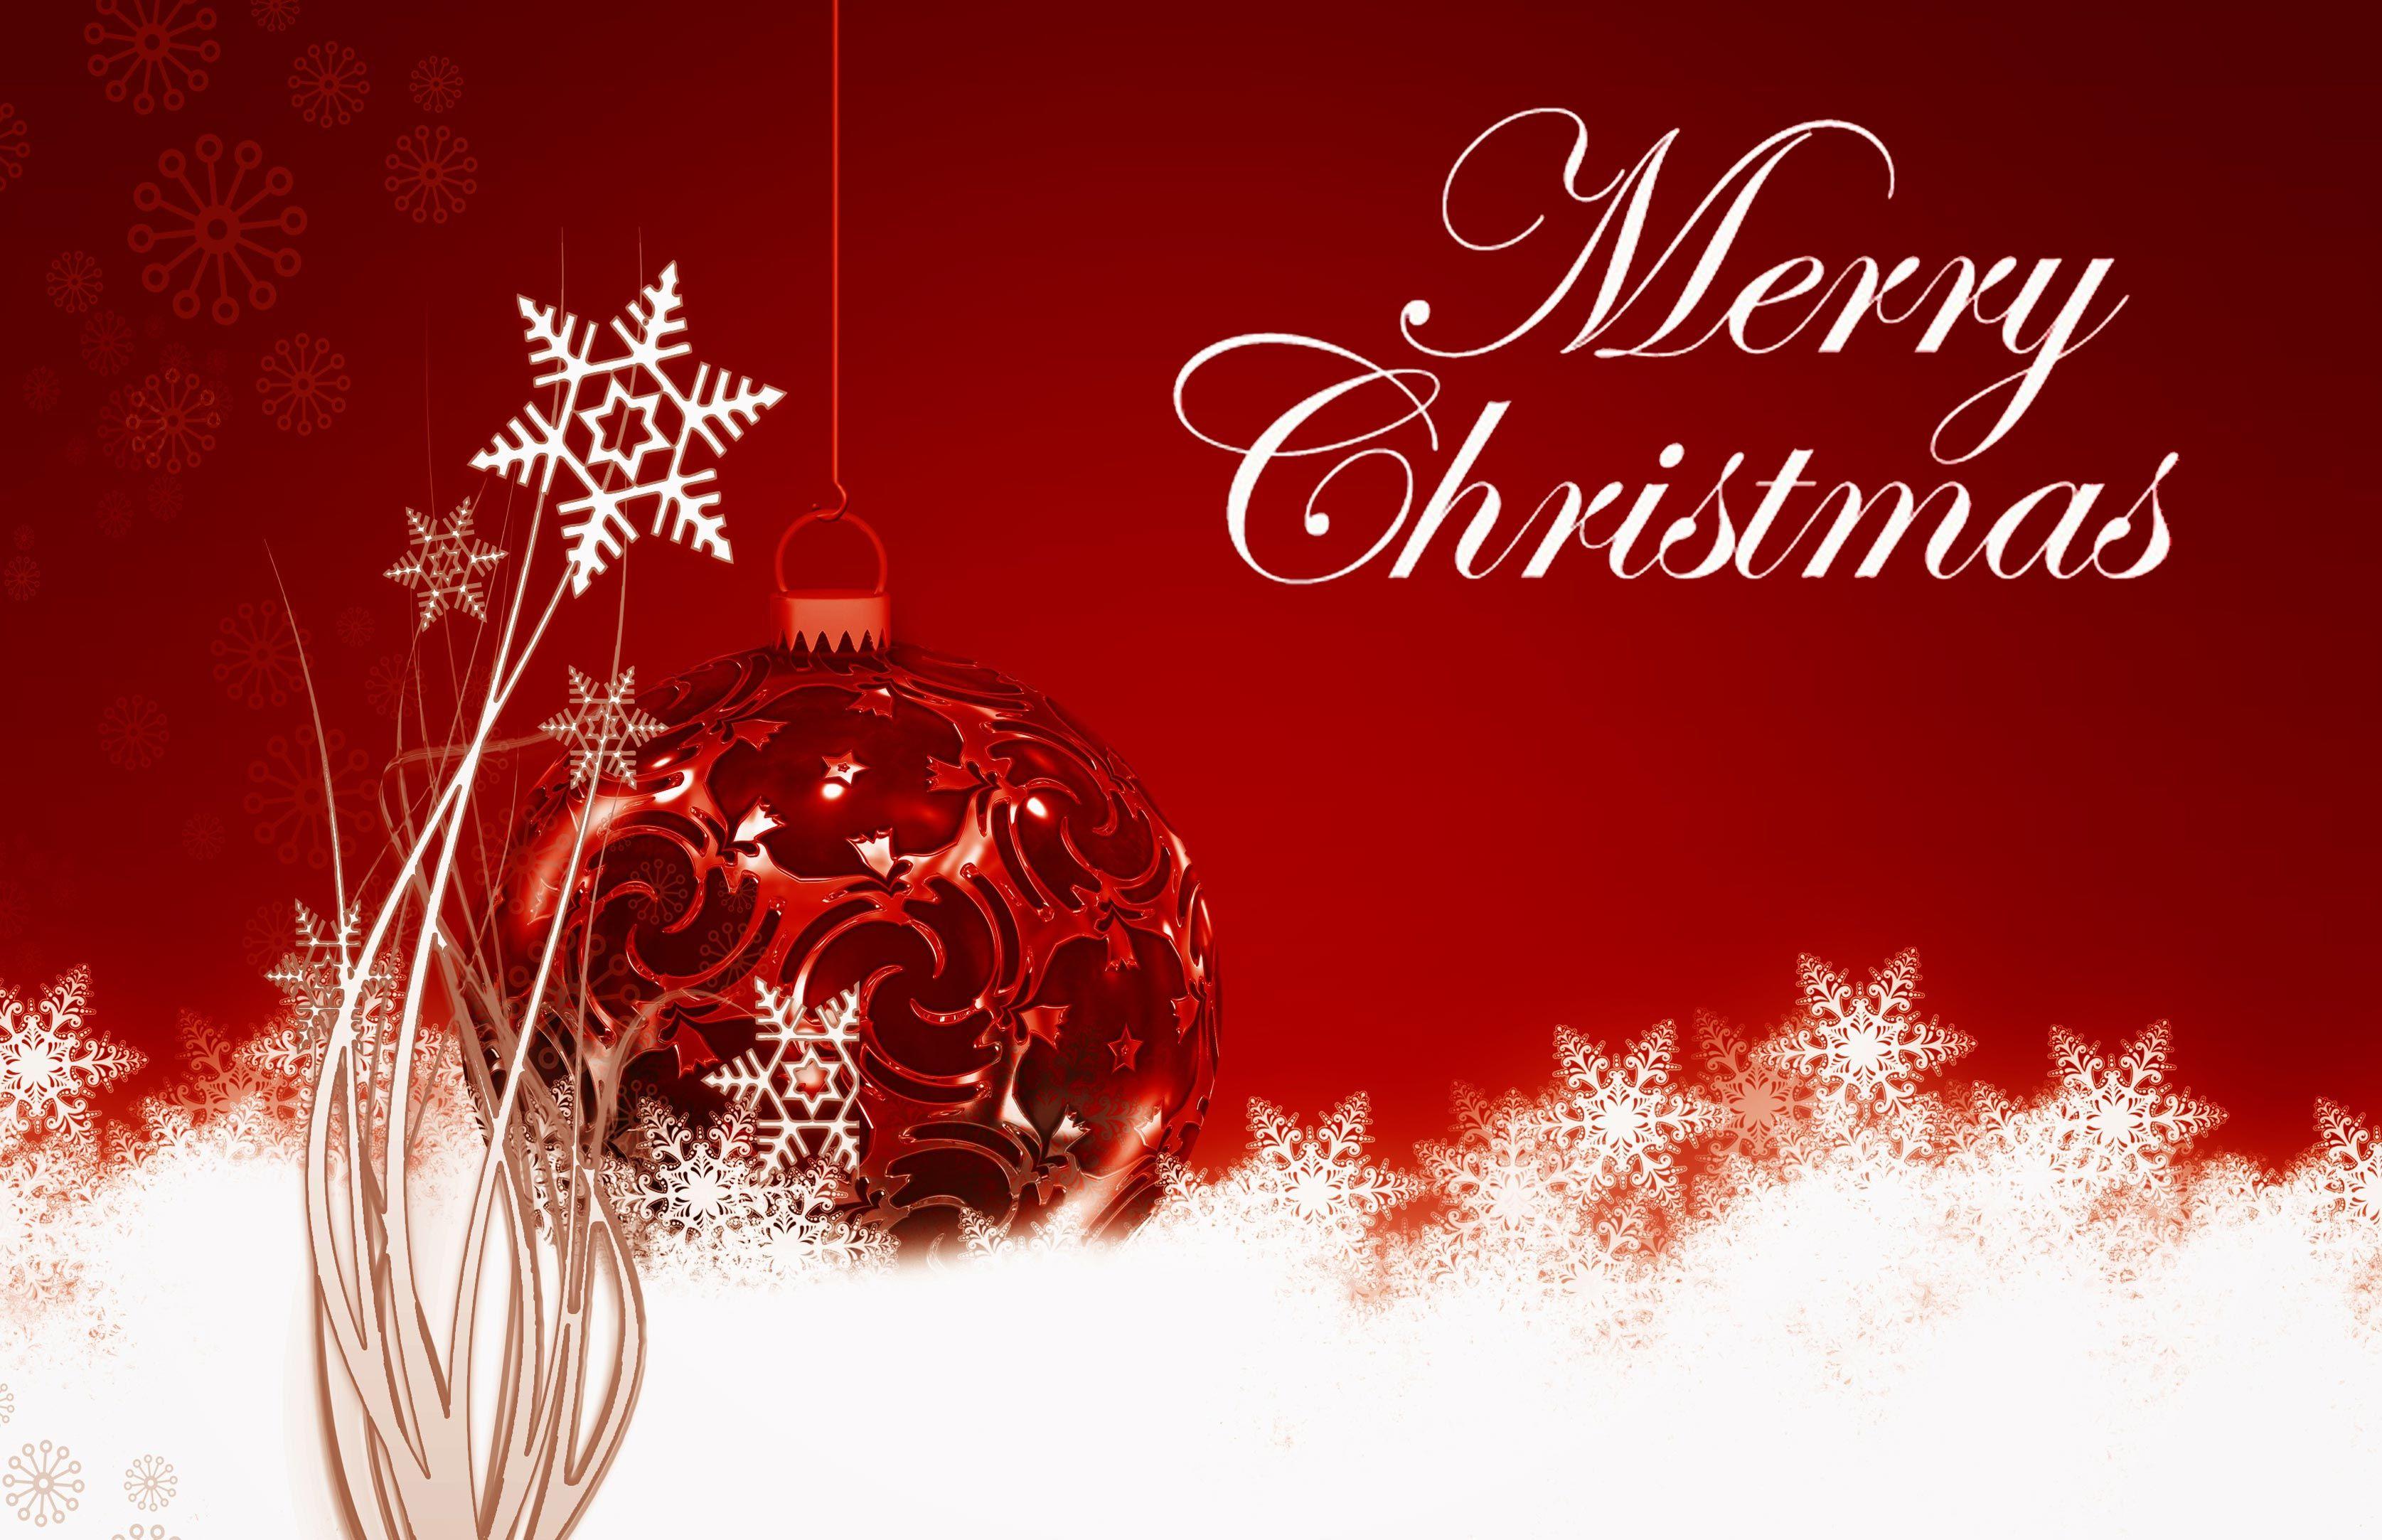 merry christmas ecard wallpaper Merry christmas message